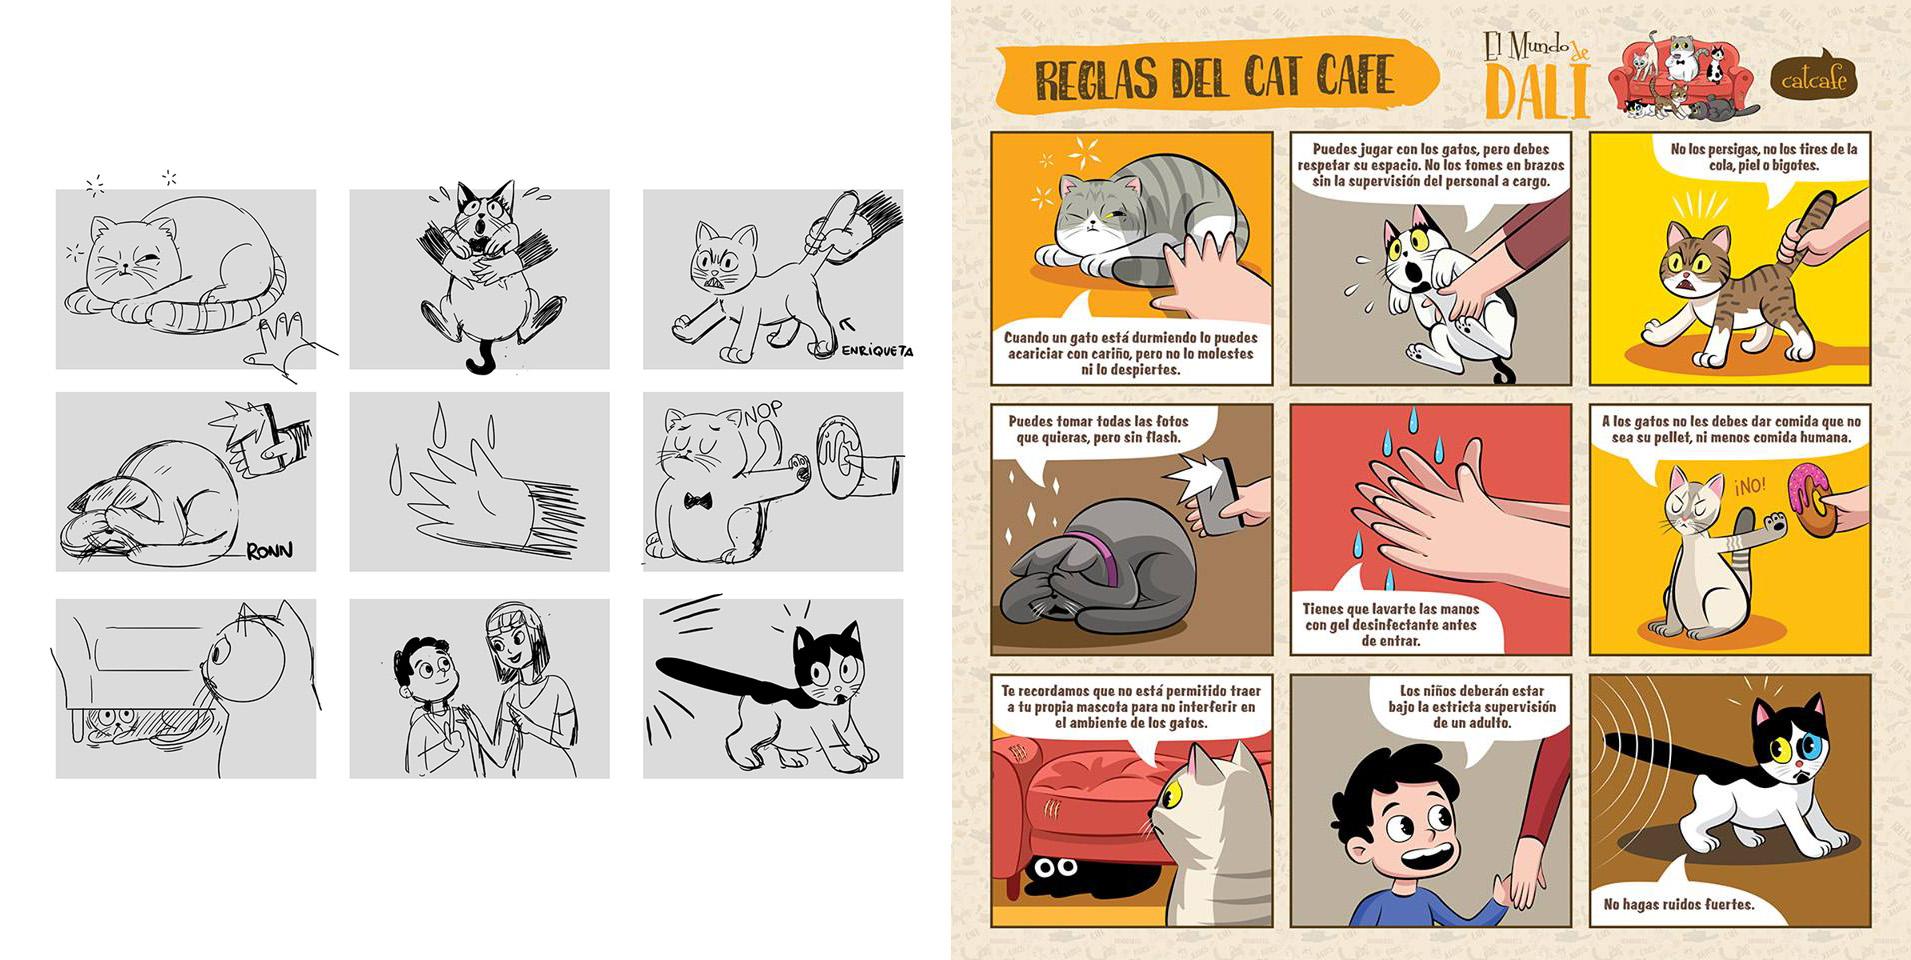 rules cat cafe.jpg